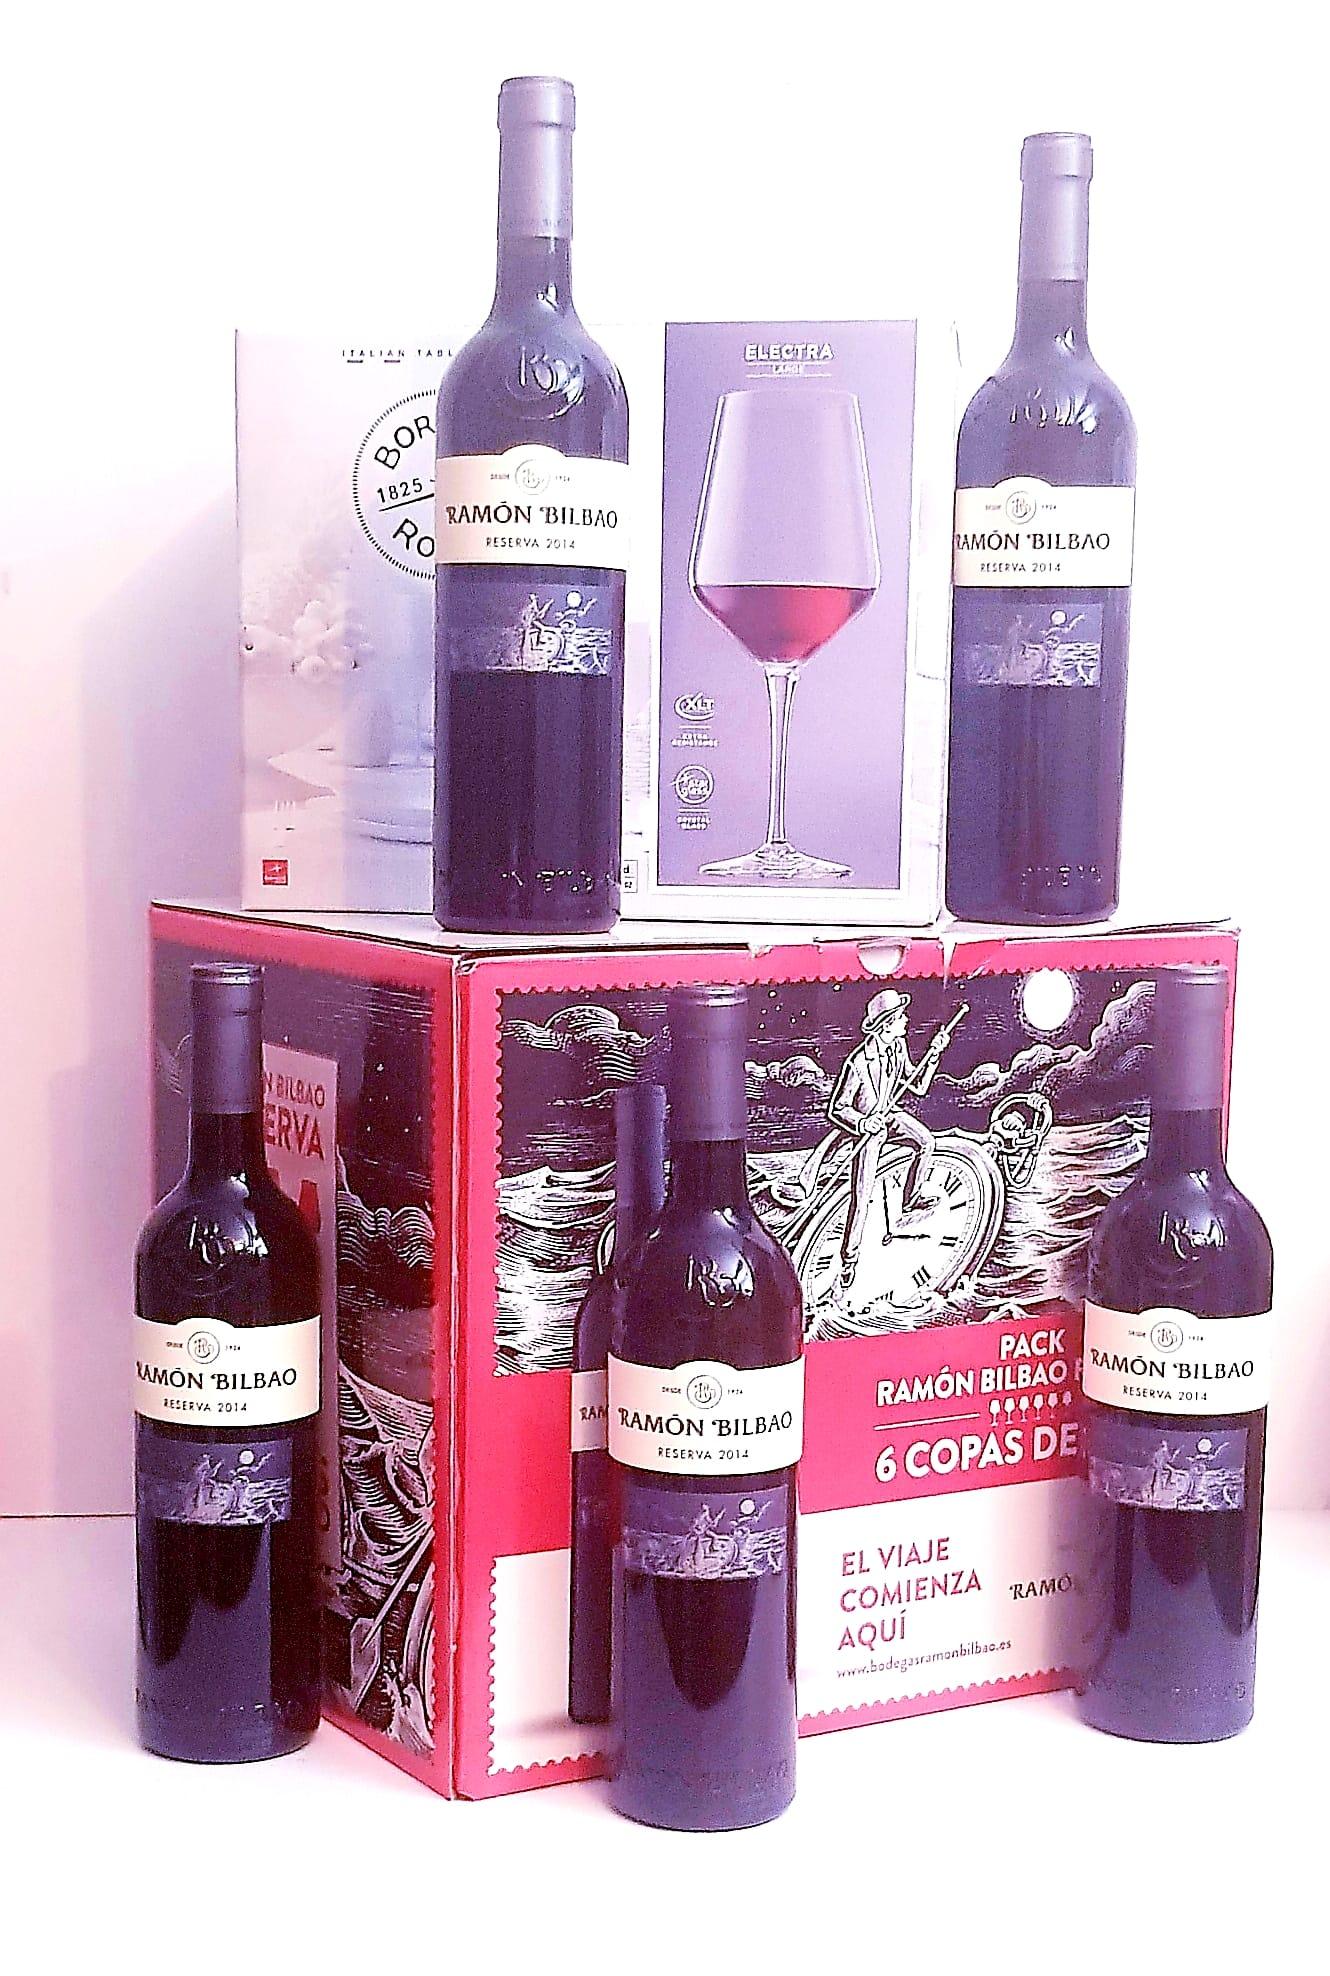 promocion-ramon-bilbao-reserva-2014-6-copas-de-vino-de-regalo